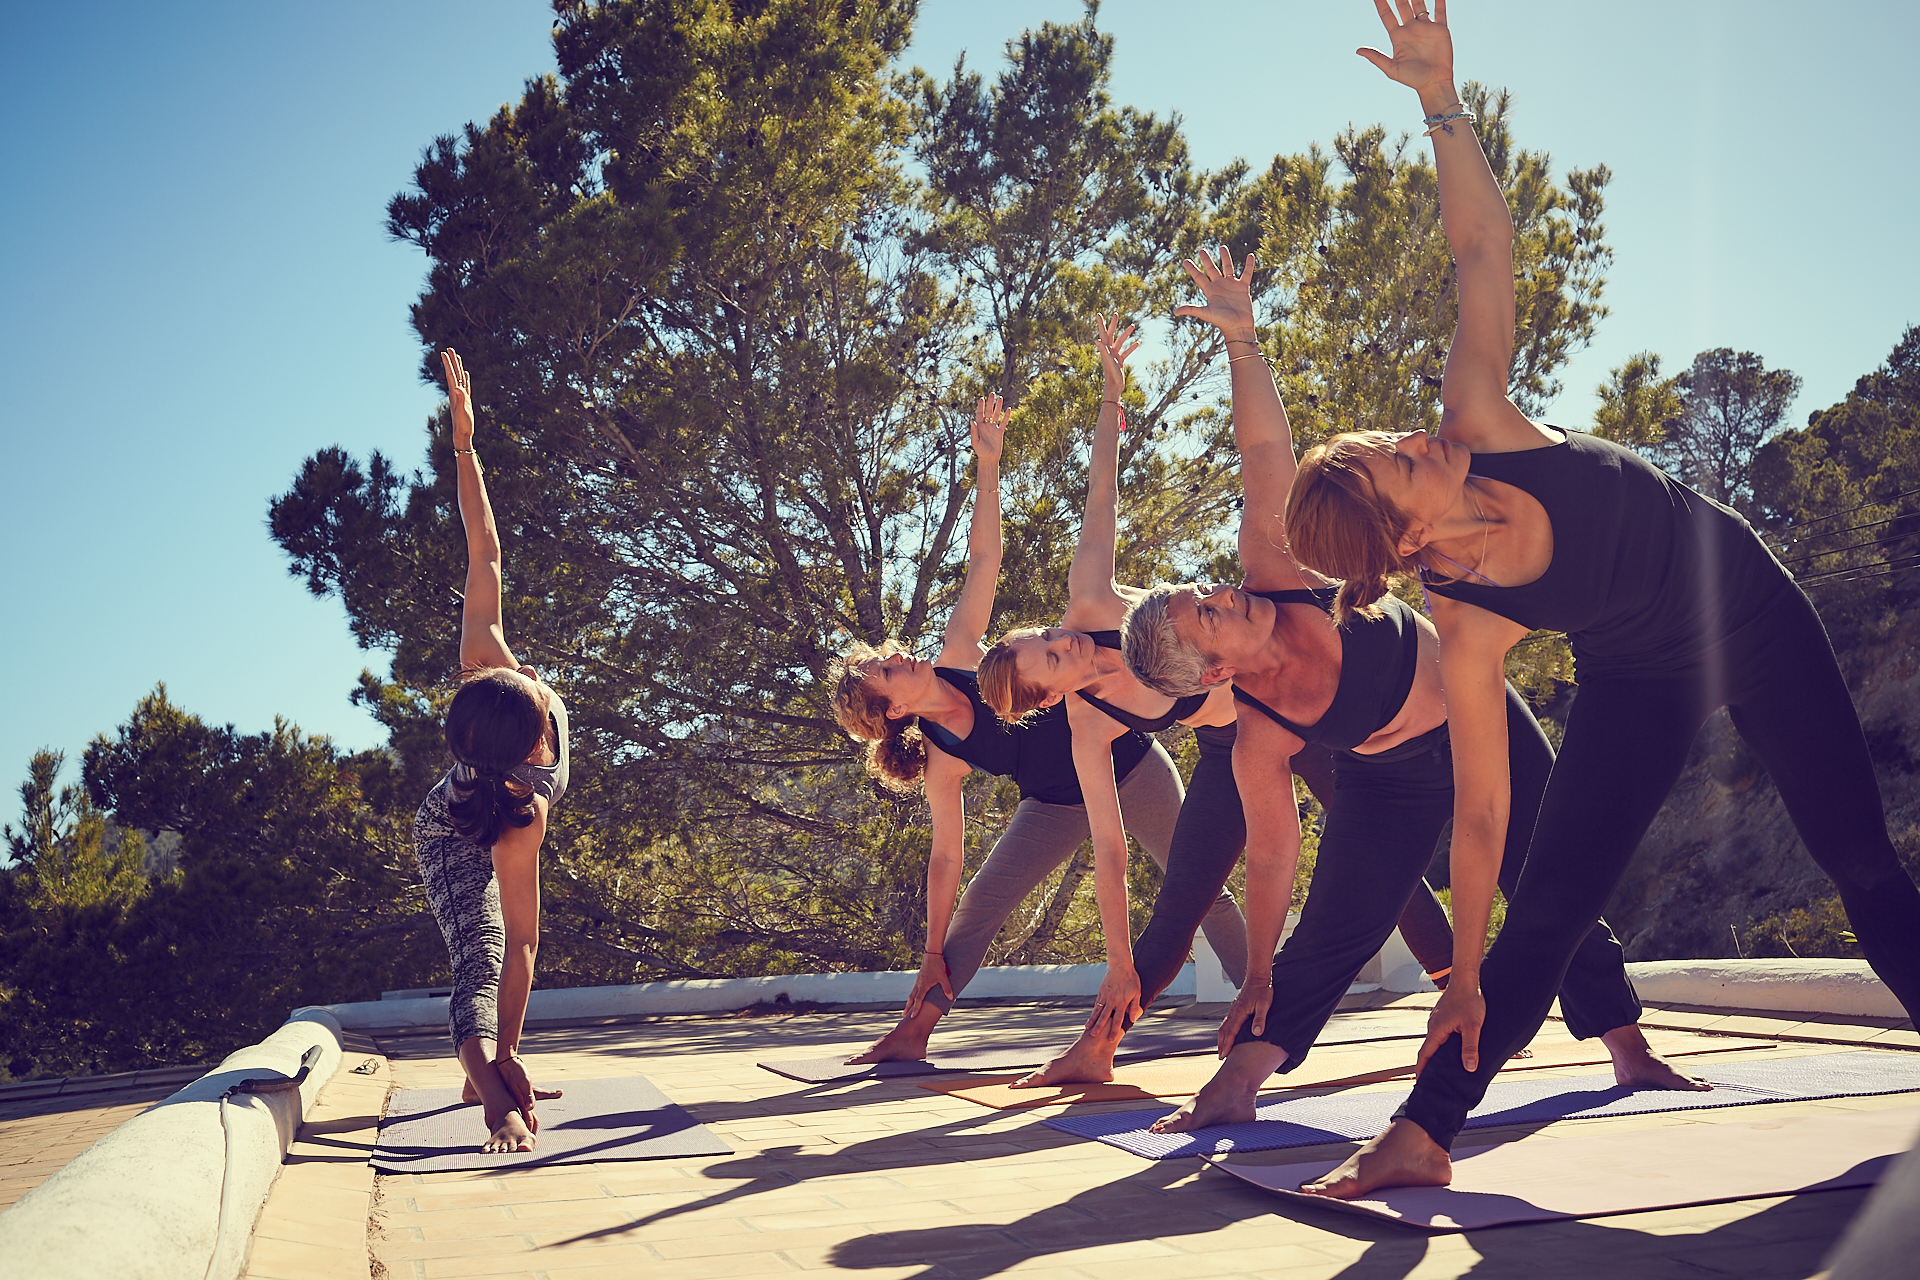 YogaTrip_598_femmes-position-yoga-exterieur-soleil-terrasse-instructrice_Maï_ibiza_benedicte_Brocard